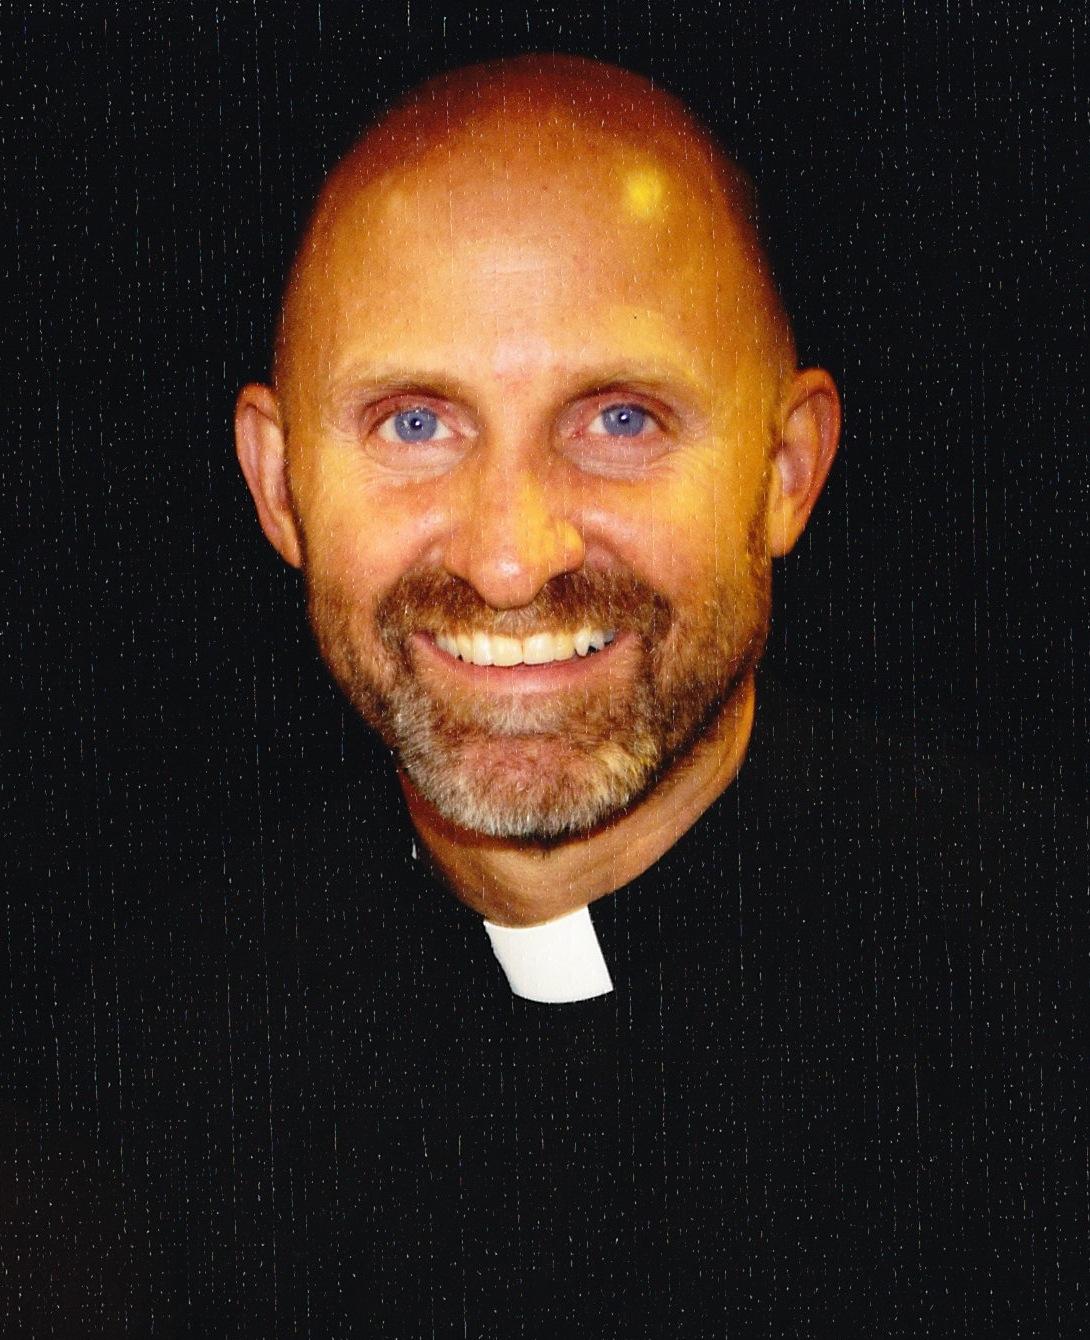 The Rev. Tim Sean Youmans